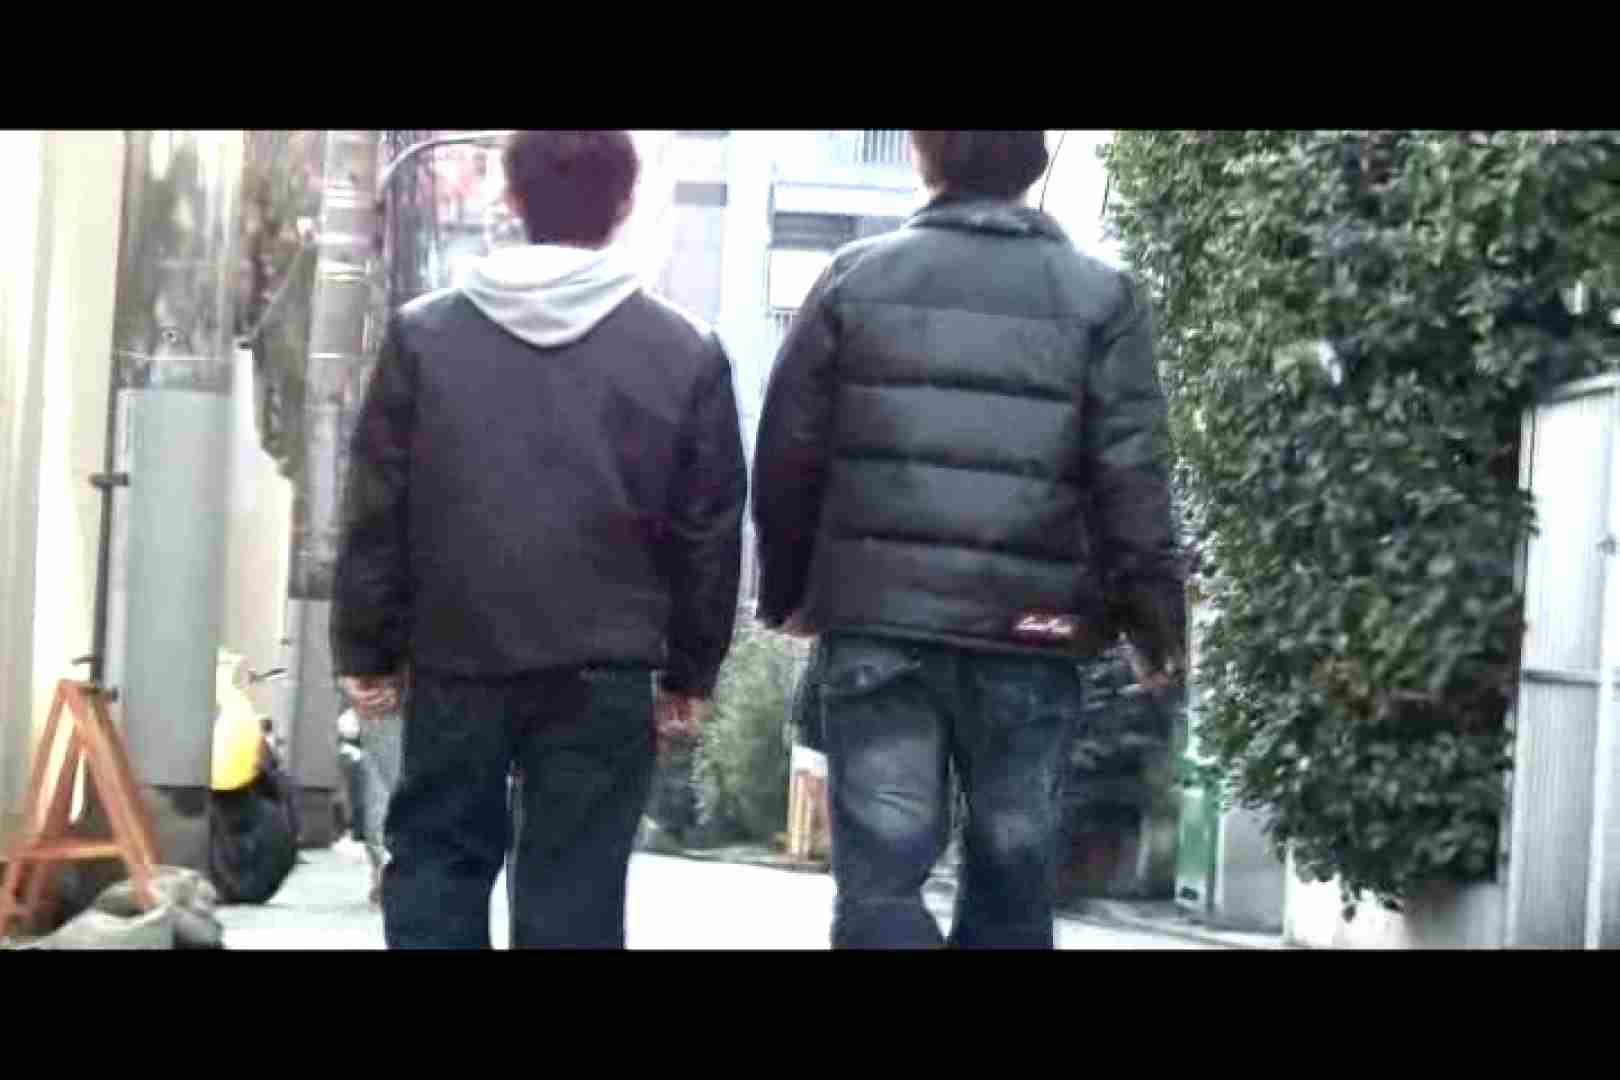 Bistro「イケメン」~Mokkori和風仕立て~vol.01 ゲイのプレイ | イケメンたち  97枚 27